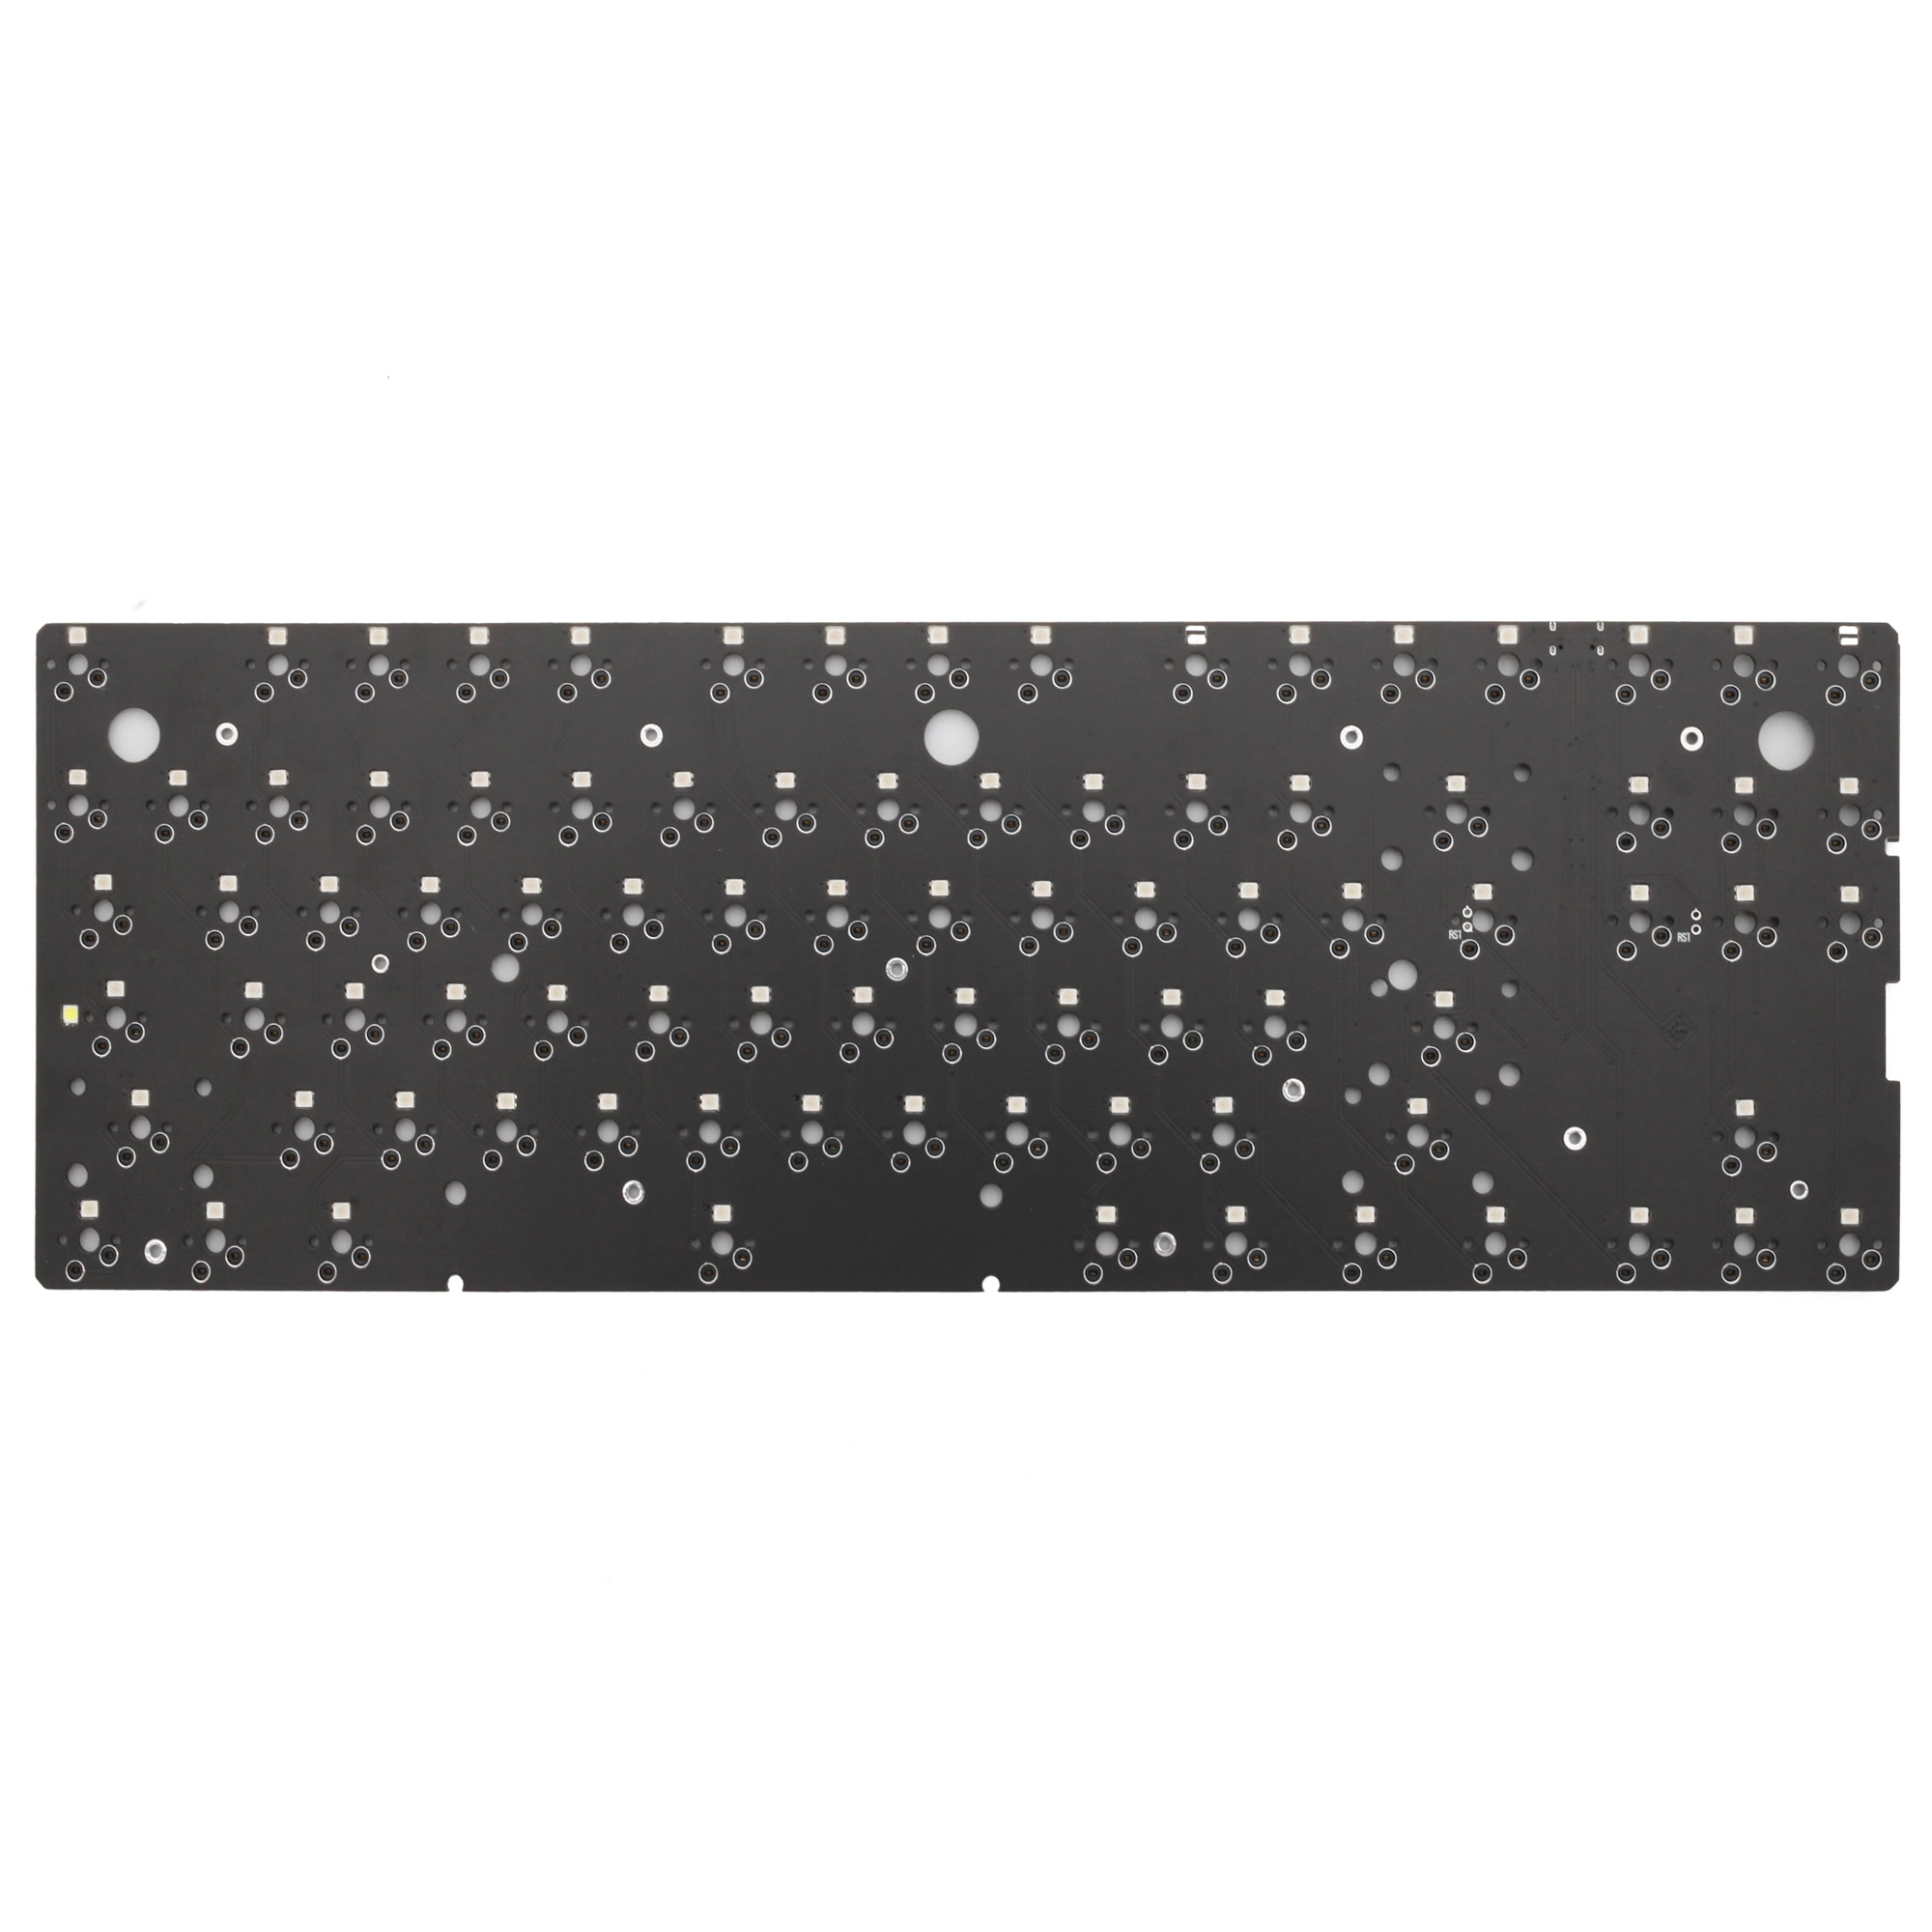 Bm80 bm80rgb 80% rgb حار قابل للتبديل مخصص لوحة المفاتيح الميكانيكية PCB مبرمجة كامل rgb التبديل تحت توهج نوع c qmk عبر البرامج الثابتة